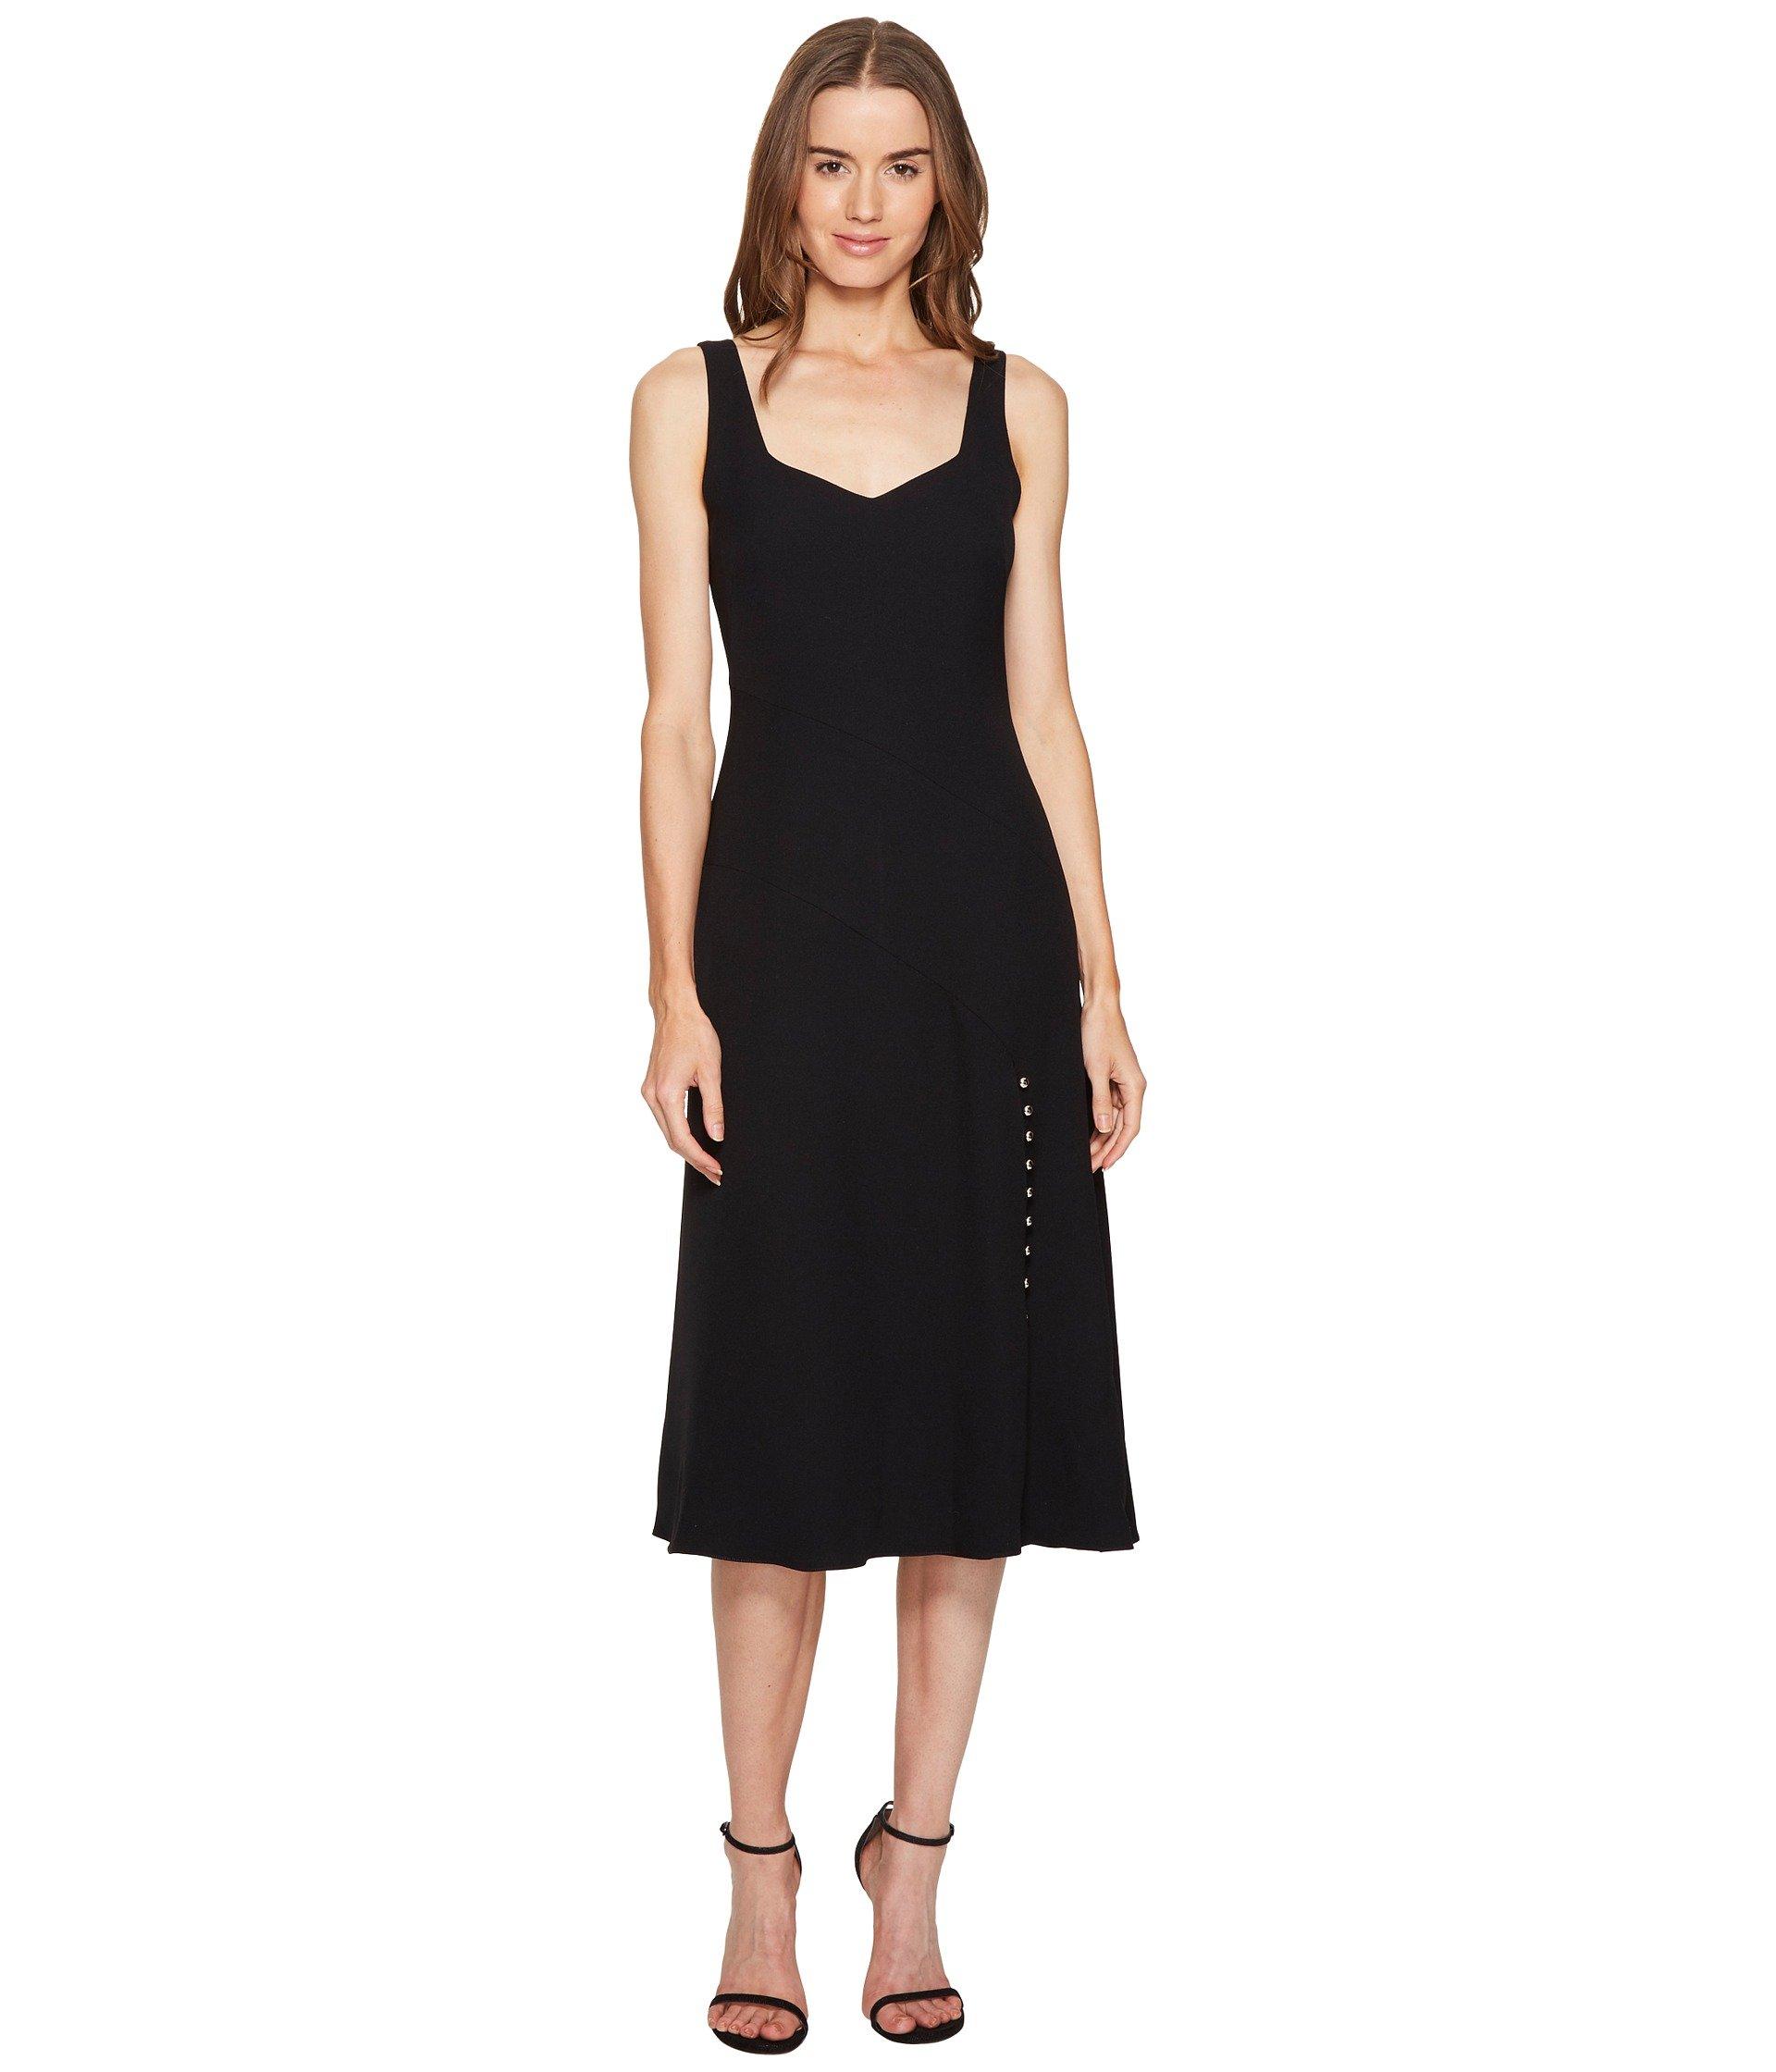 CREPE V-NECK SHEATH FLARE DRESS